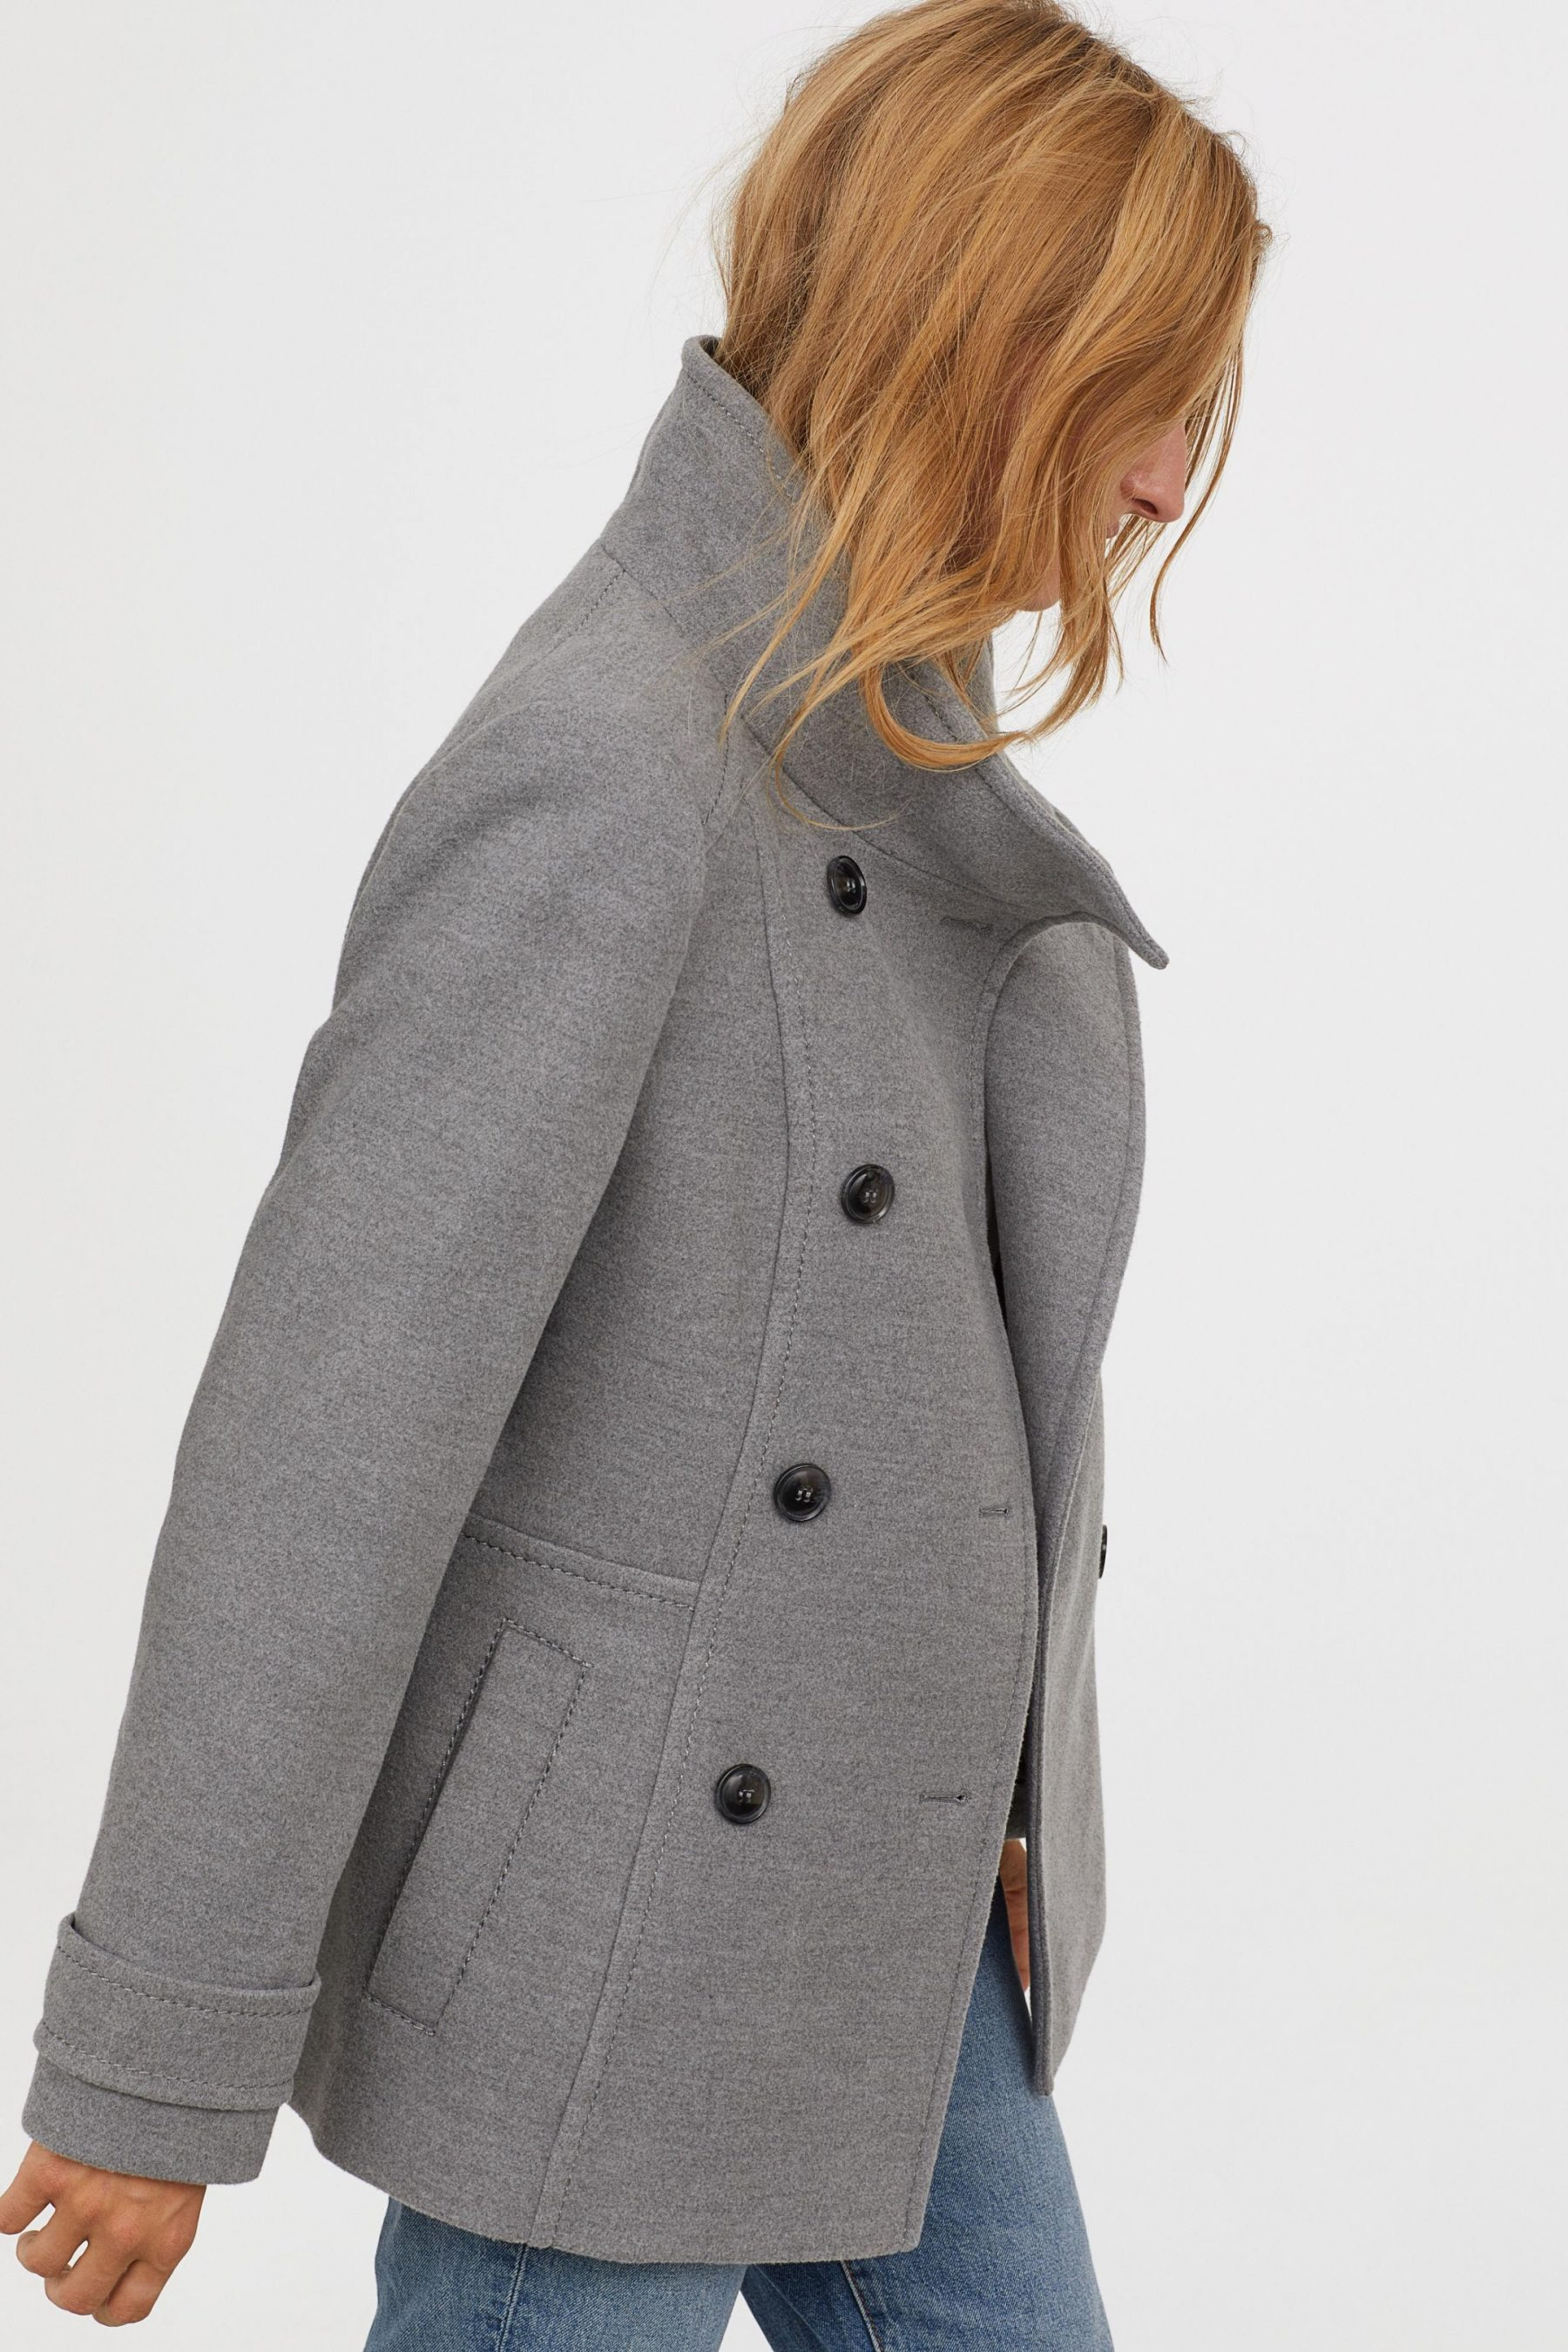 Пальто H&M Демисезон (3352) photo 0